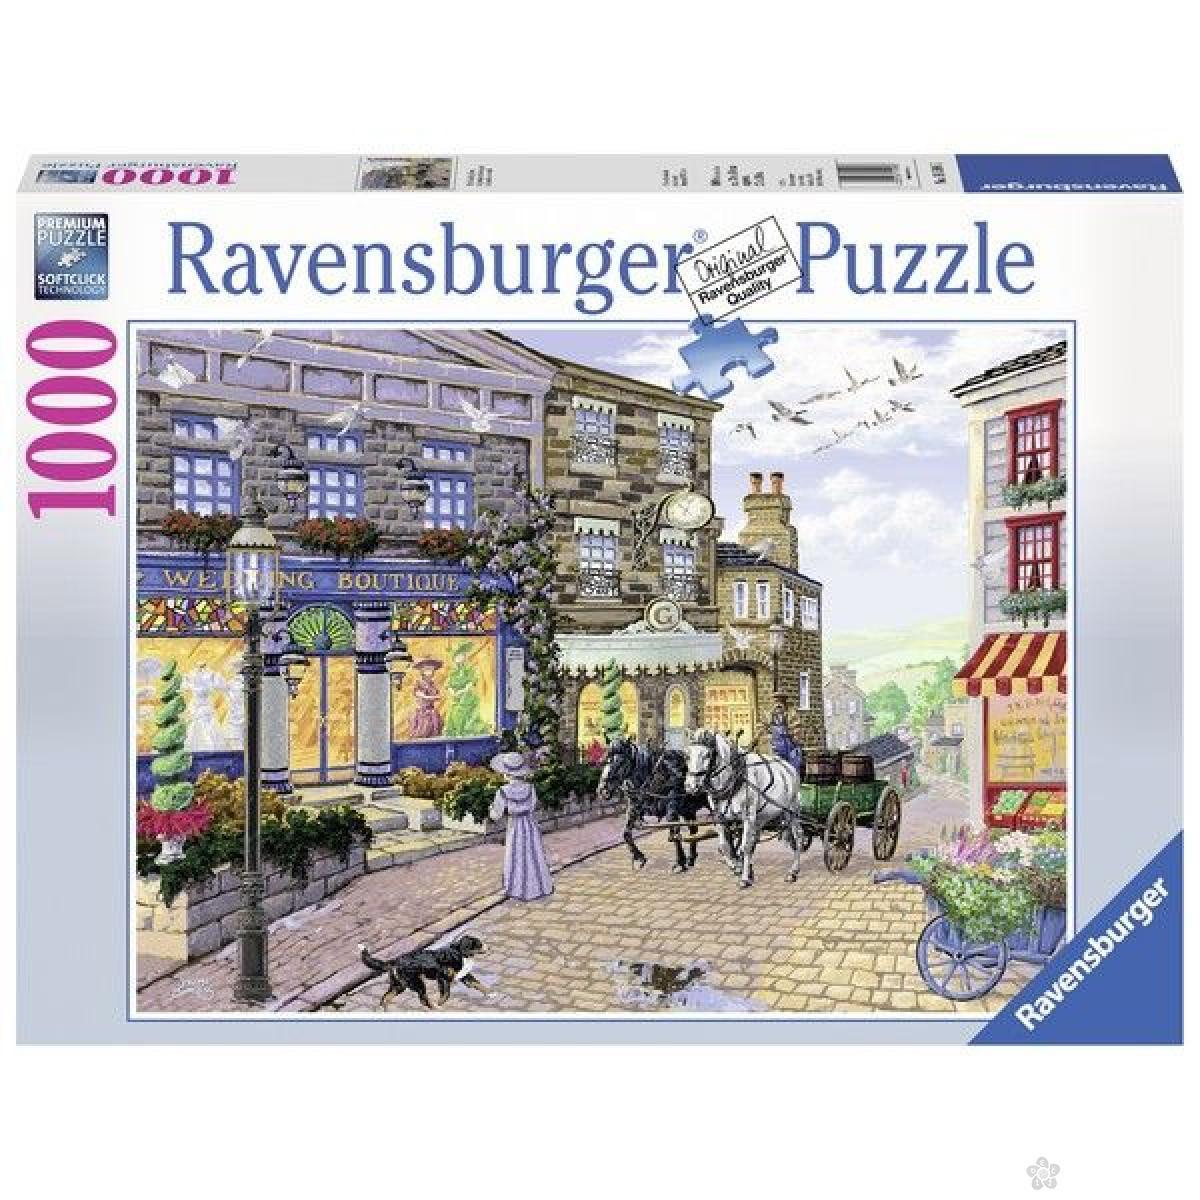 Ravensburger puzzle (slagalice) - Prodavnica venčanica RA19598